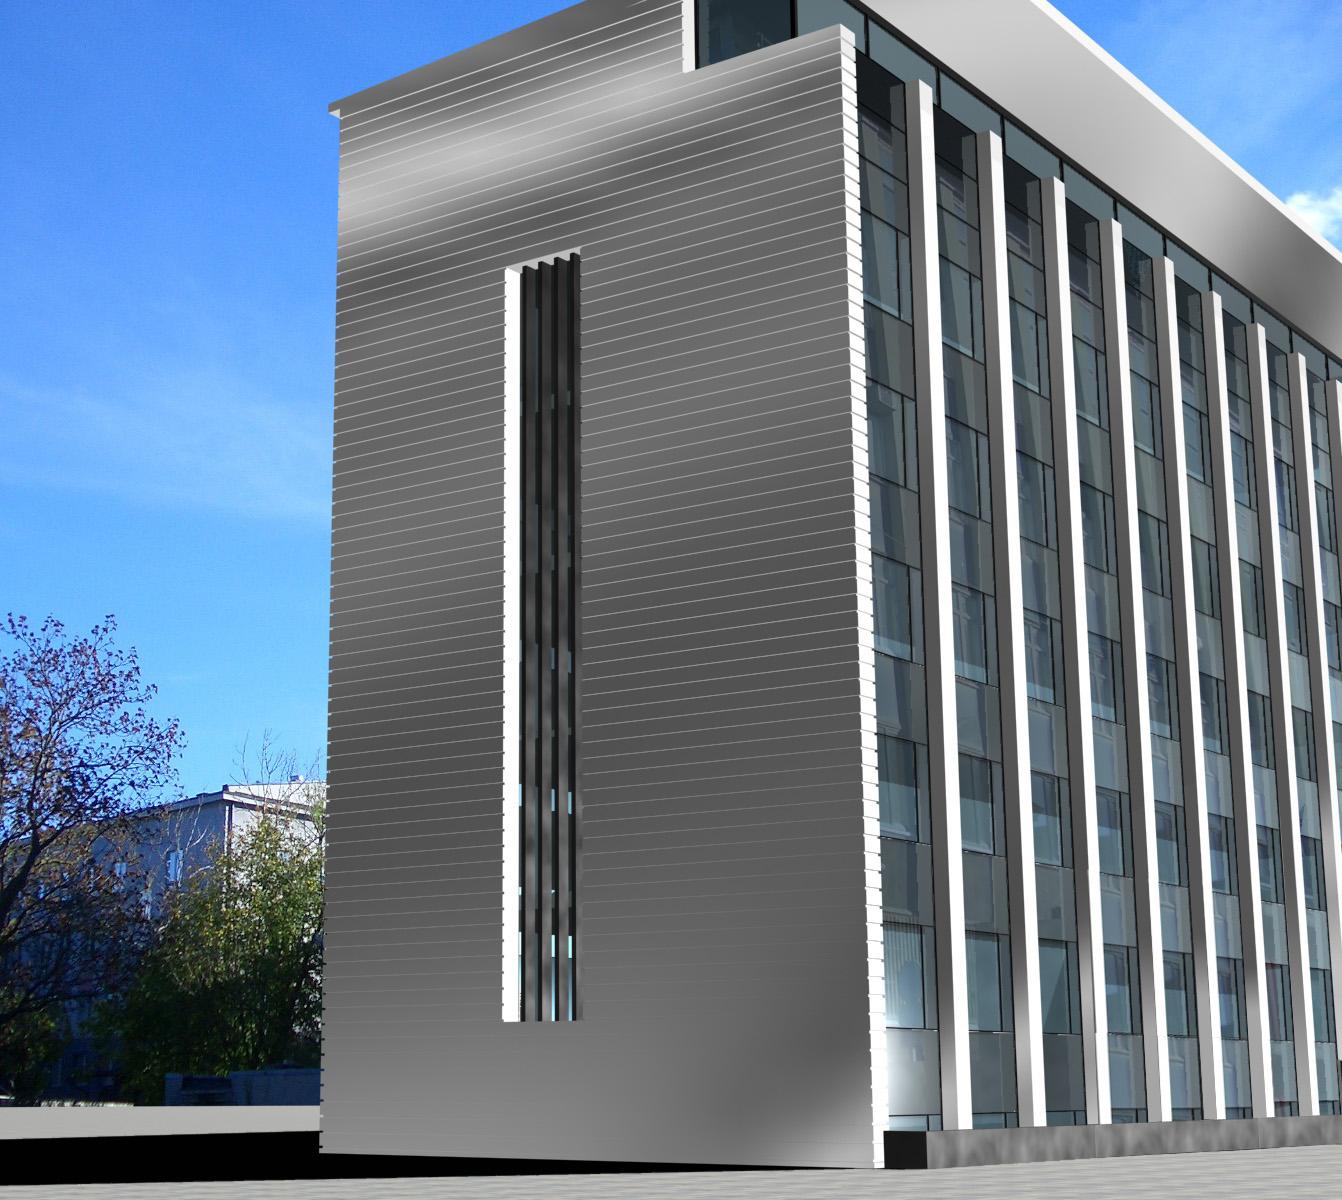 OFFICE BLOCK RECONSTRUCTION IN TALLINN